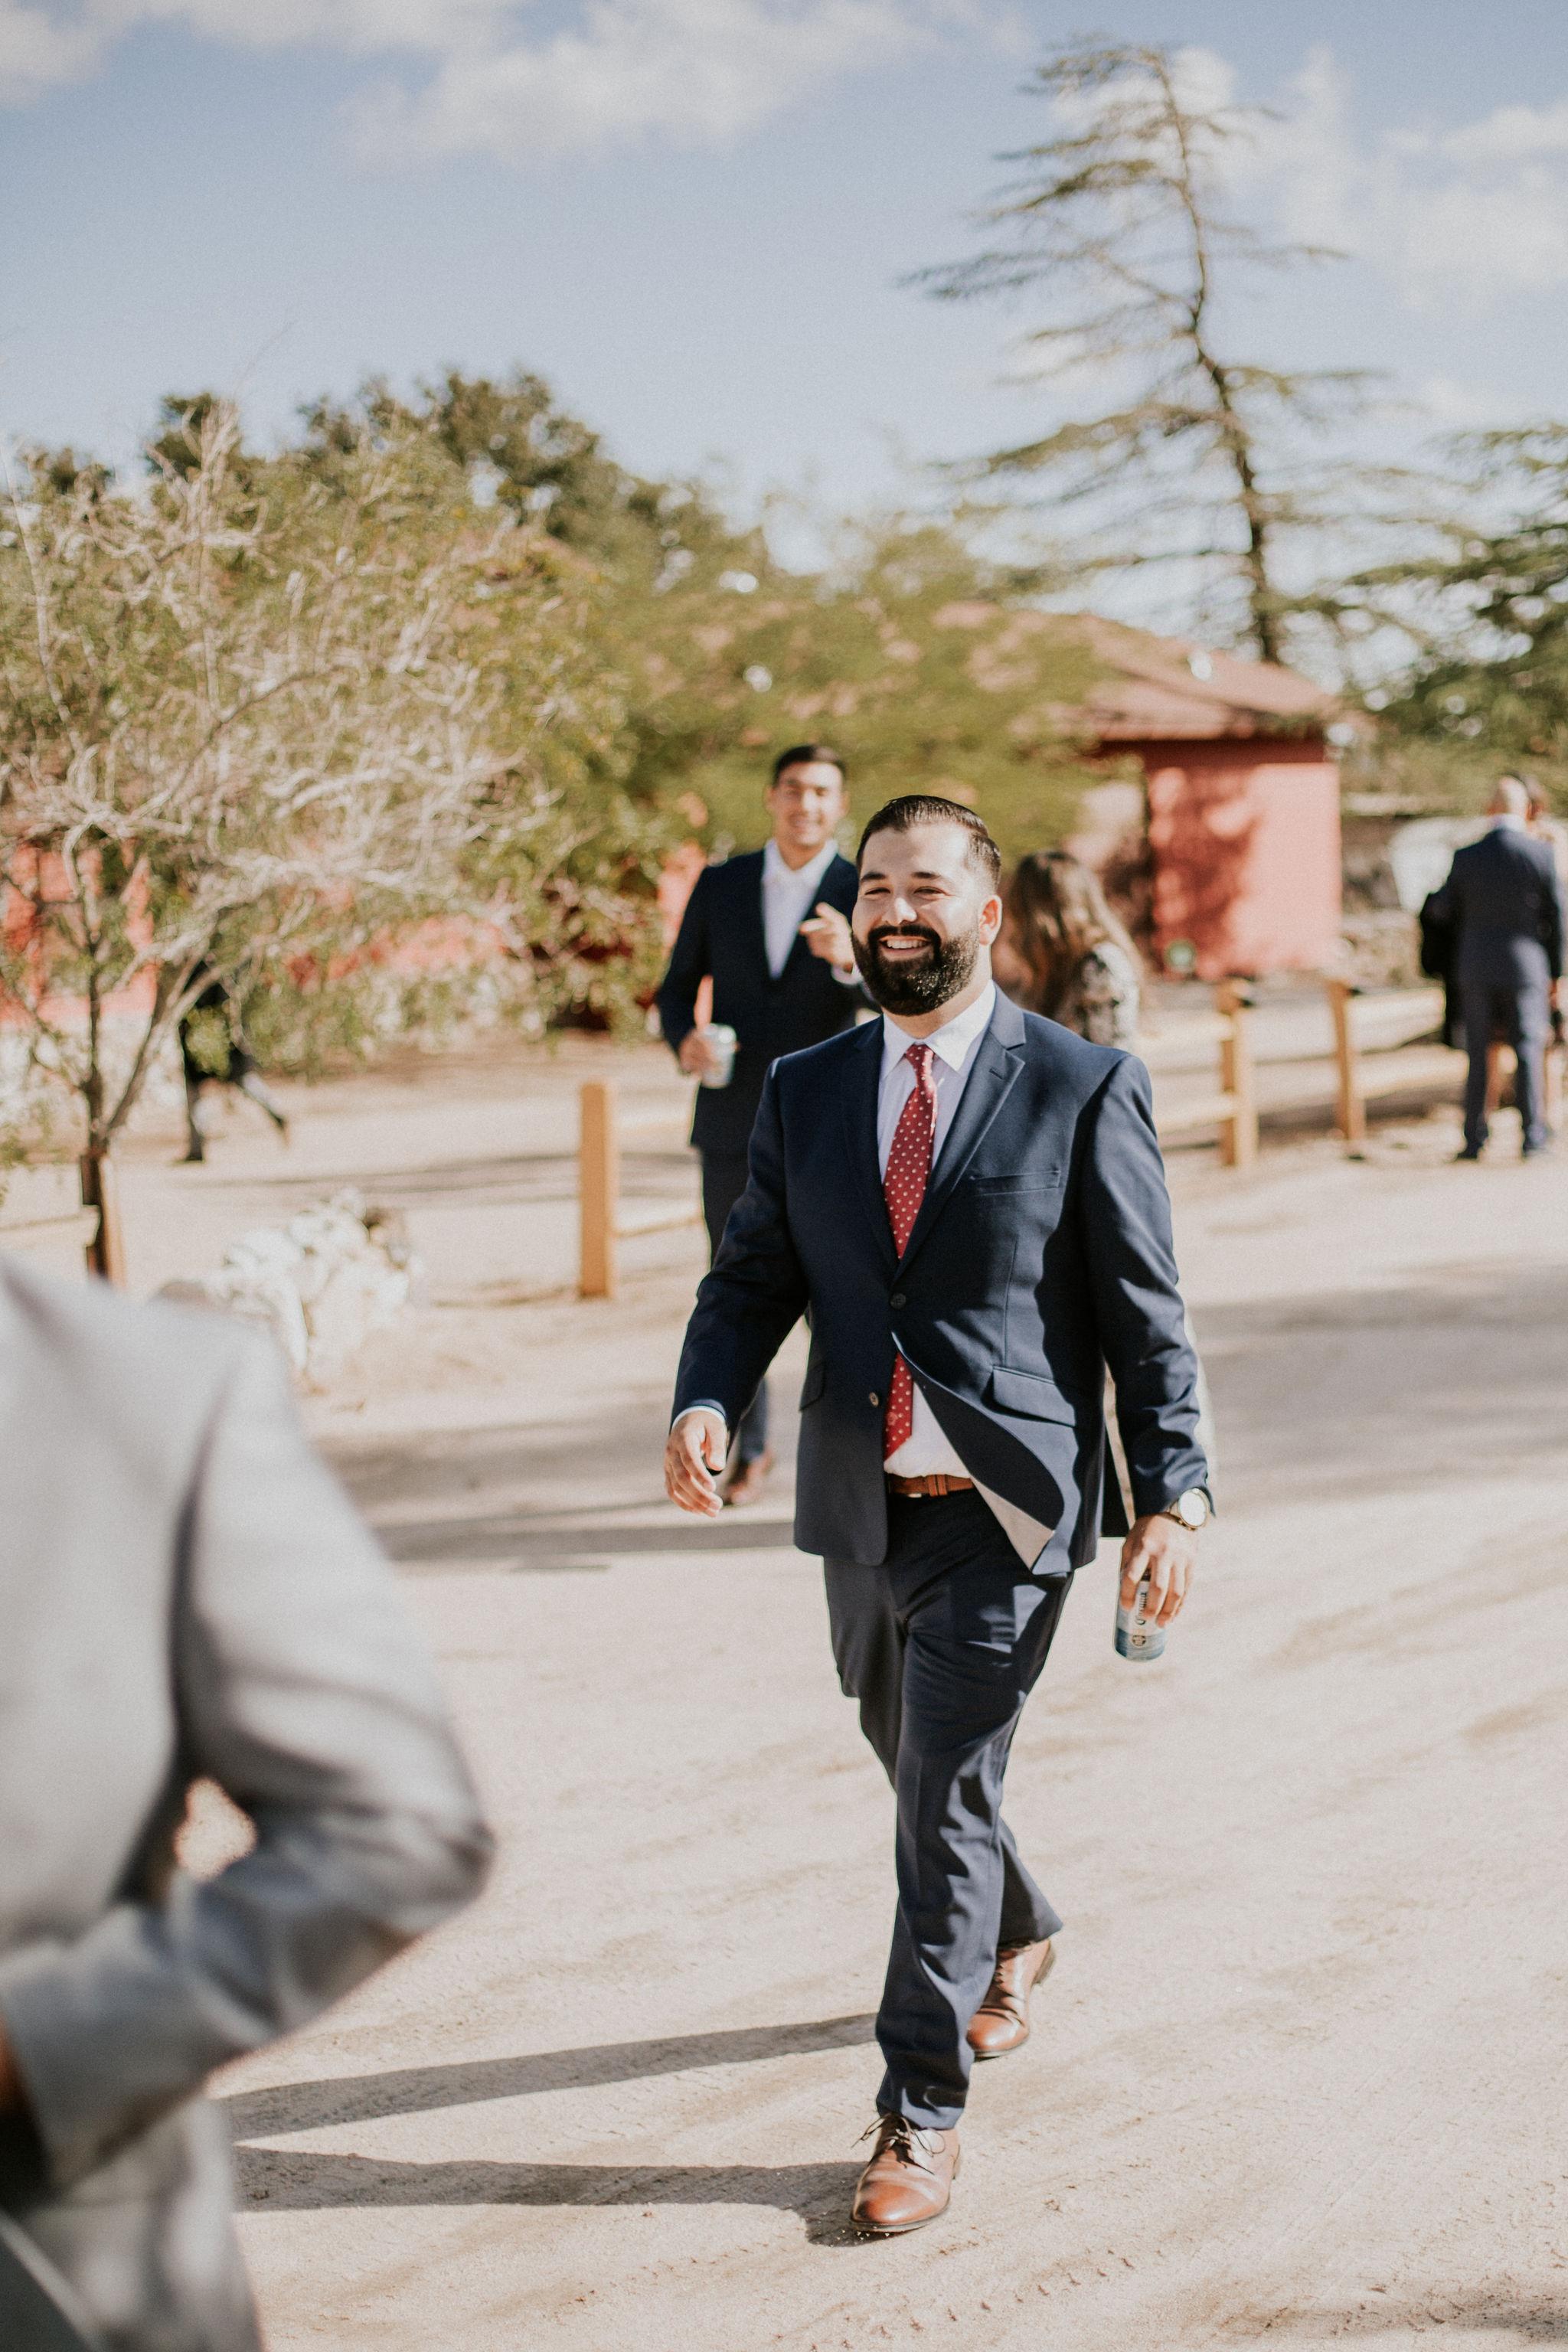 RimrockRanch-JoshuaTree-Wedding-Jami-Laree-153.jpg